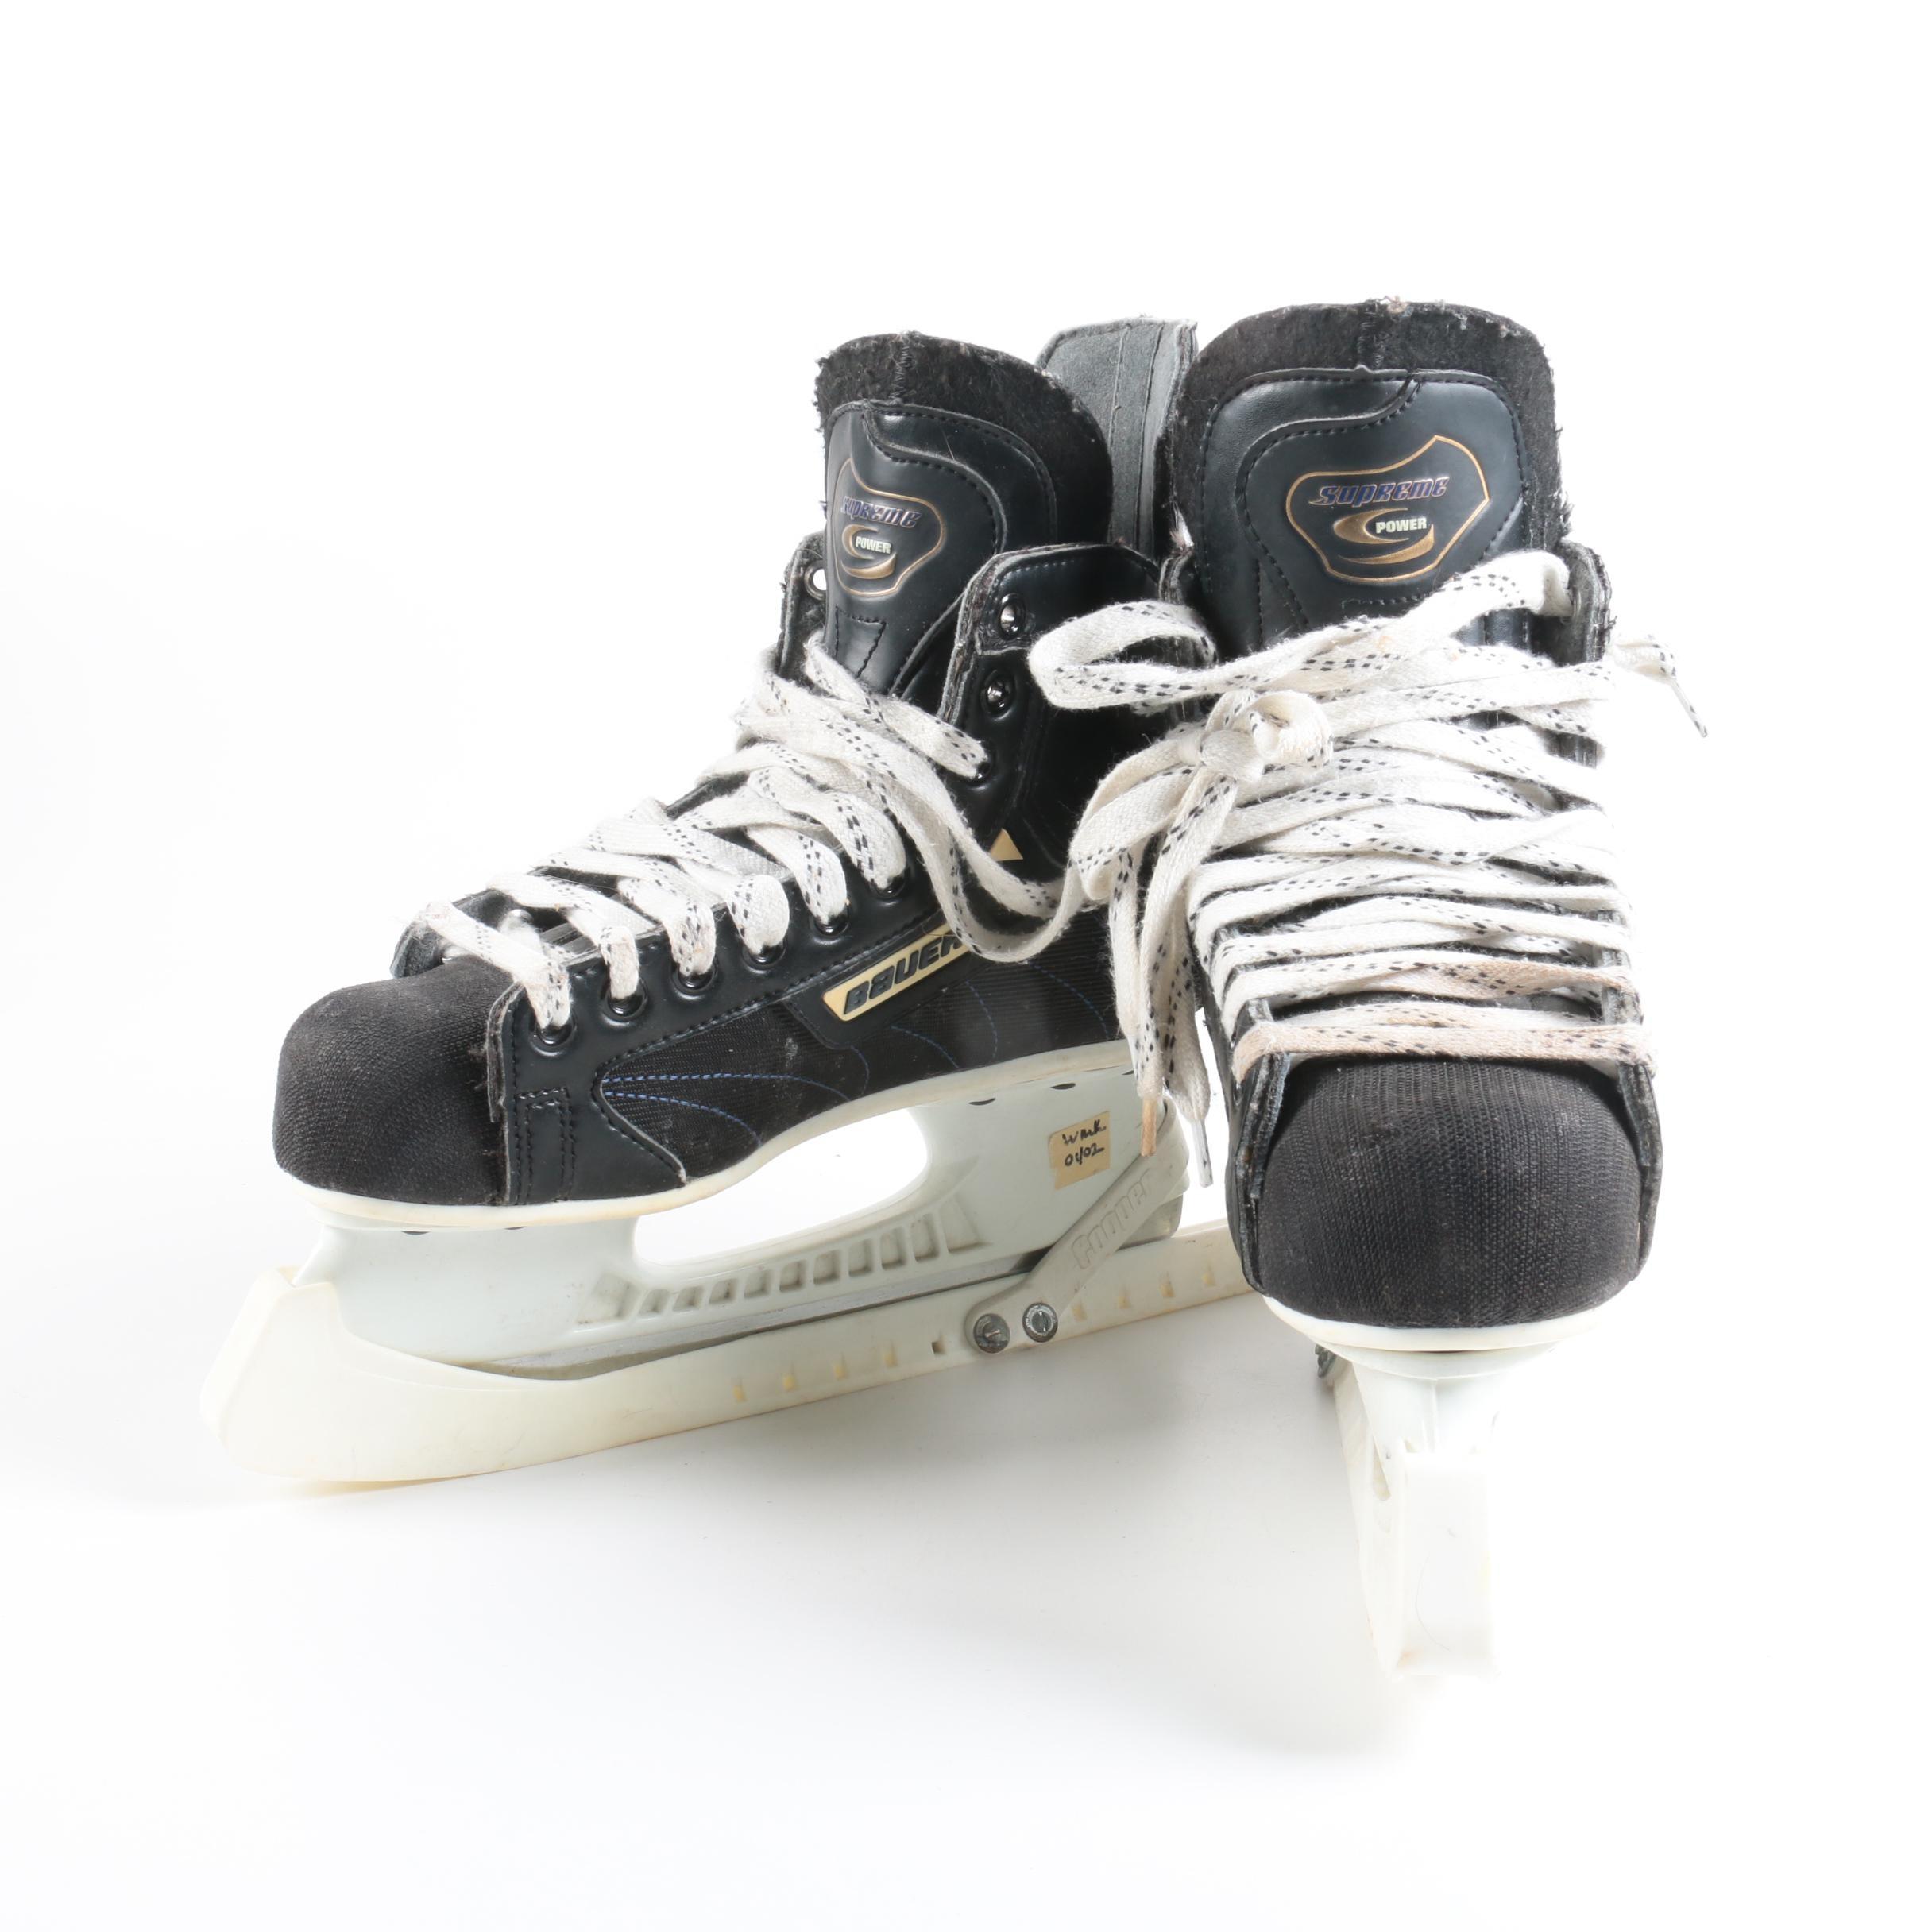 Bauer Supreme 1000 Ice Hockey Skates